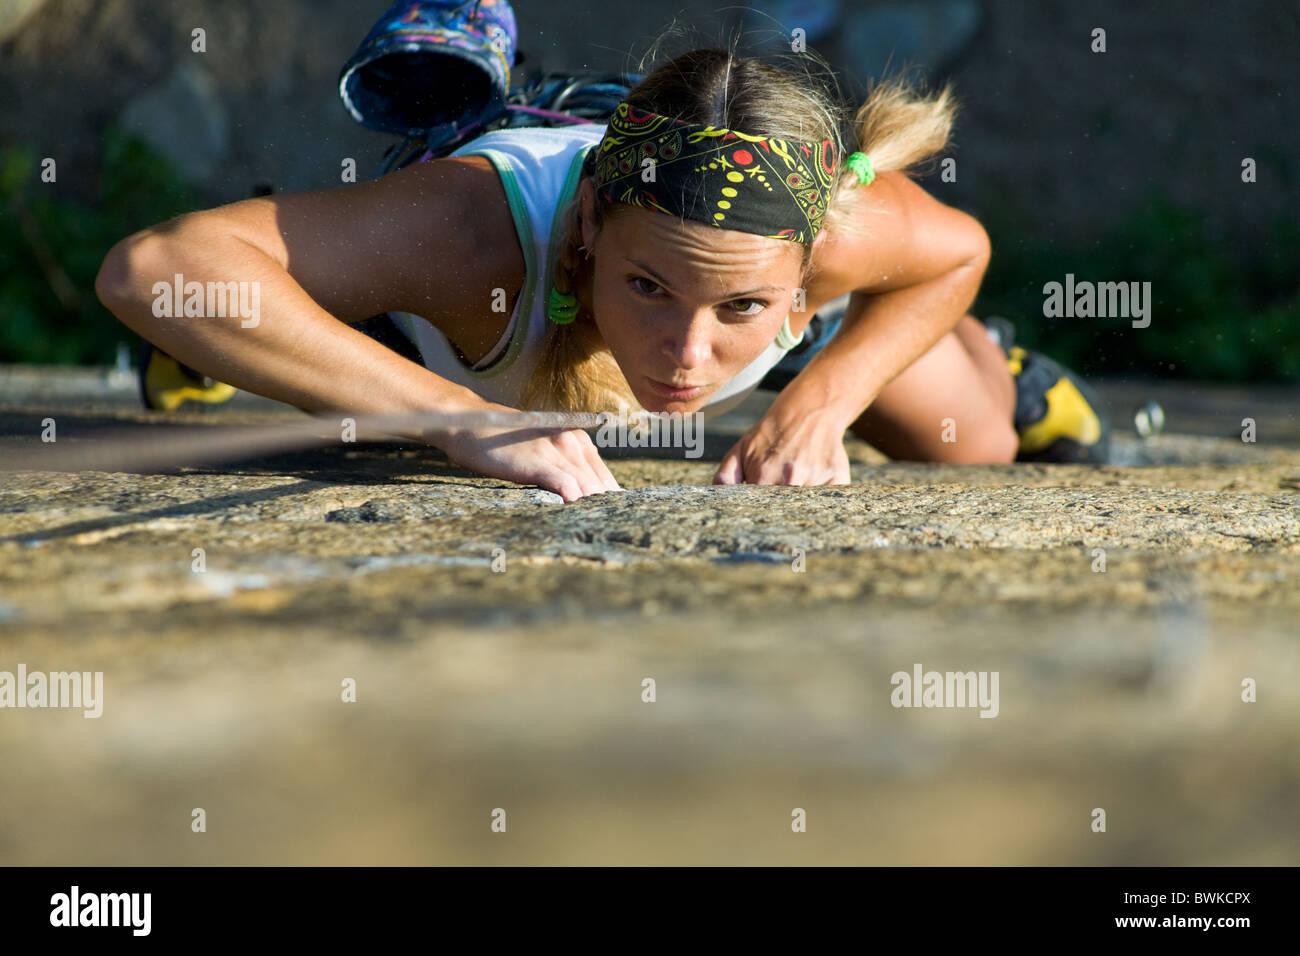 Jolie jeune fille monte une roche de granit Photo Stock